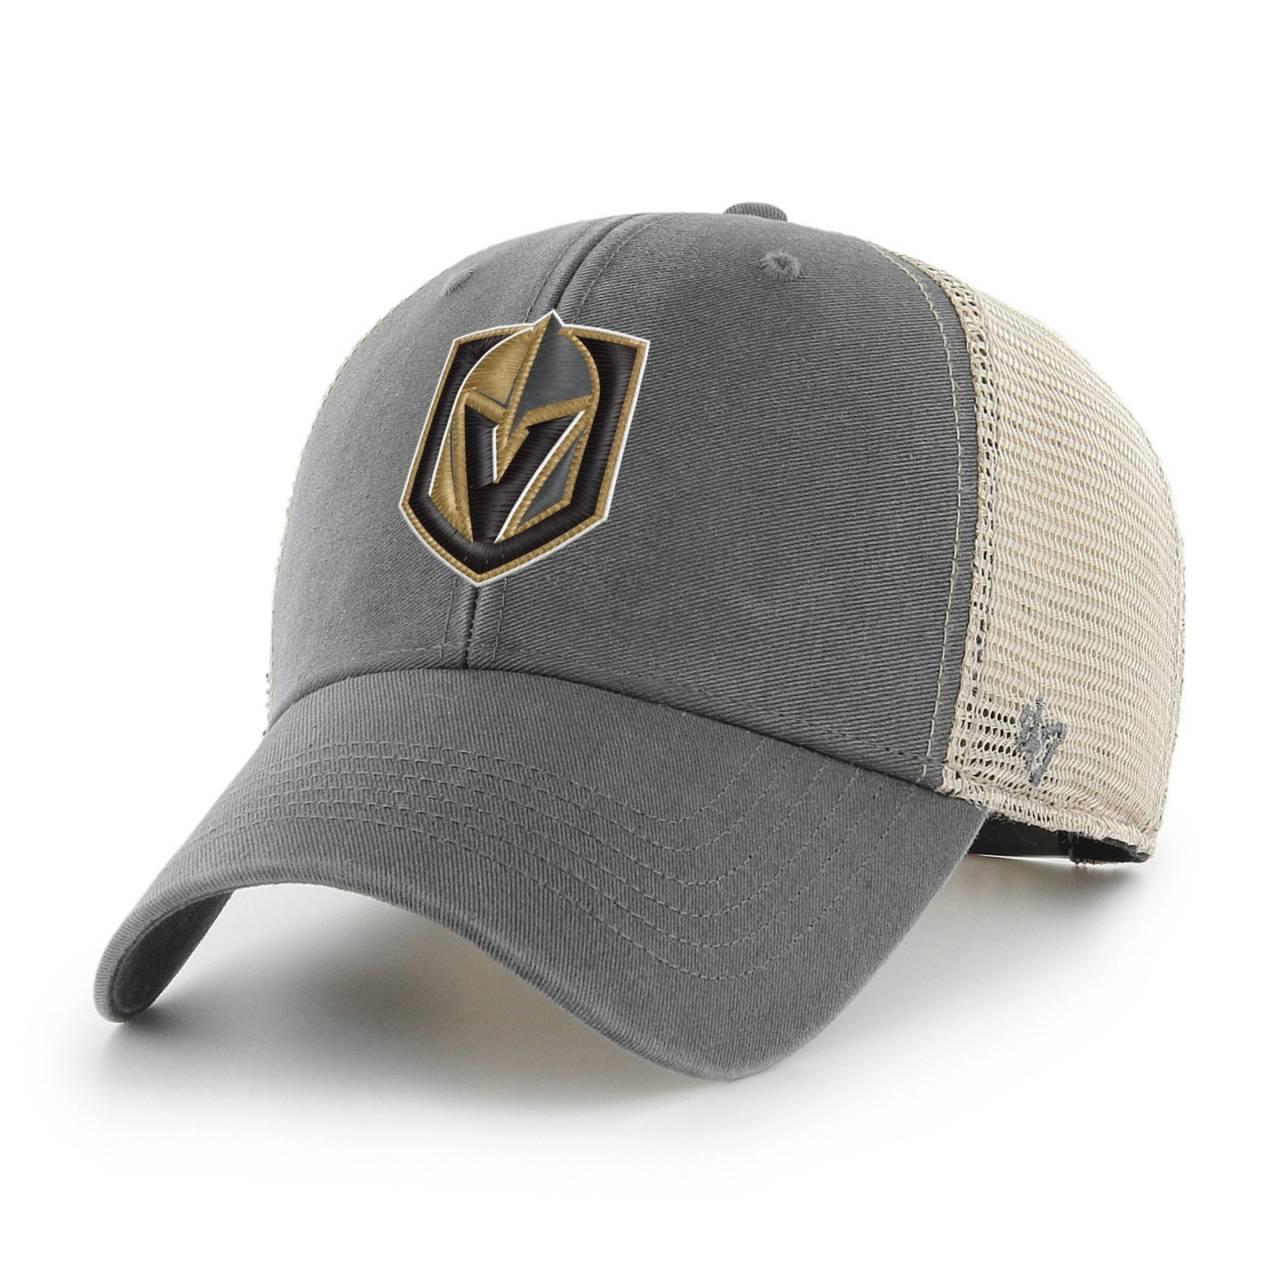 NHL VEGAS GOLDEN KNIGHTS FLAGSHIP WASH '47 MVP GREY CAP